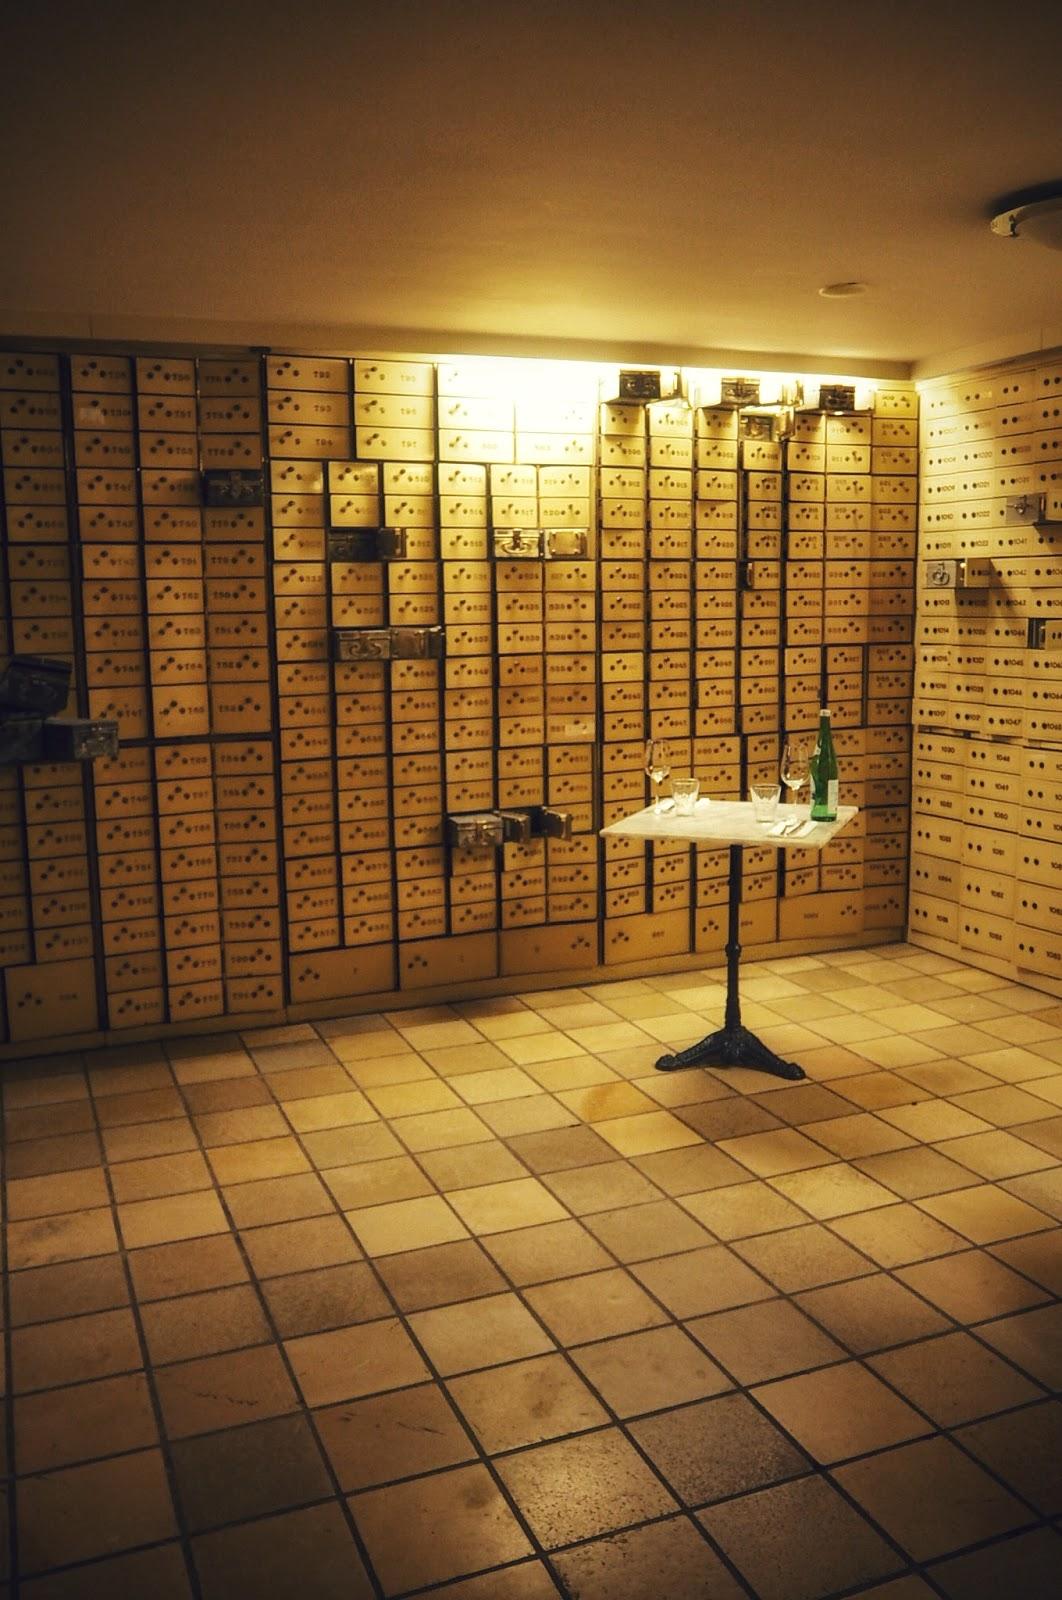 Vault at Robbies Den Bosch